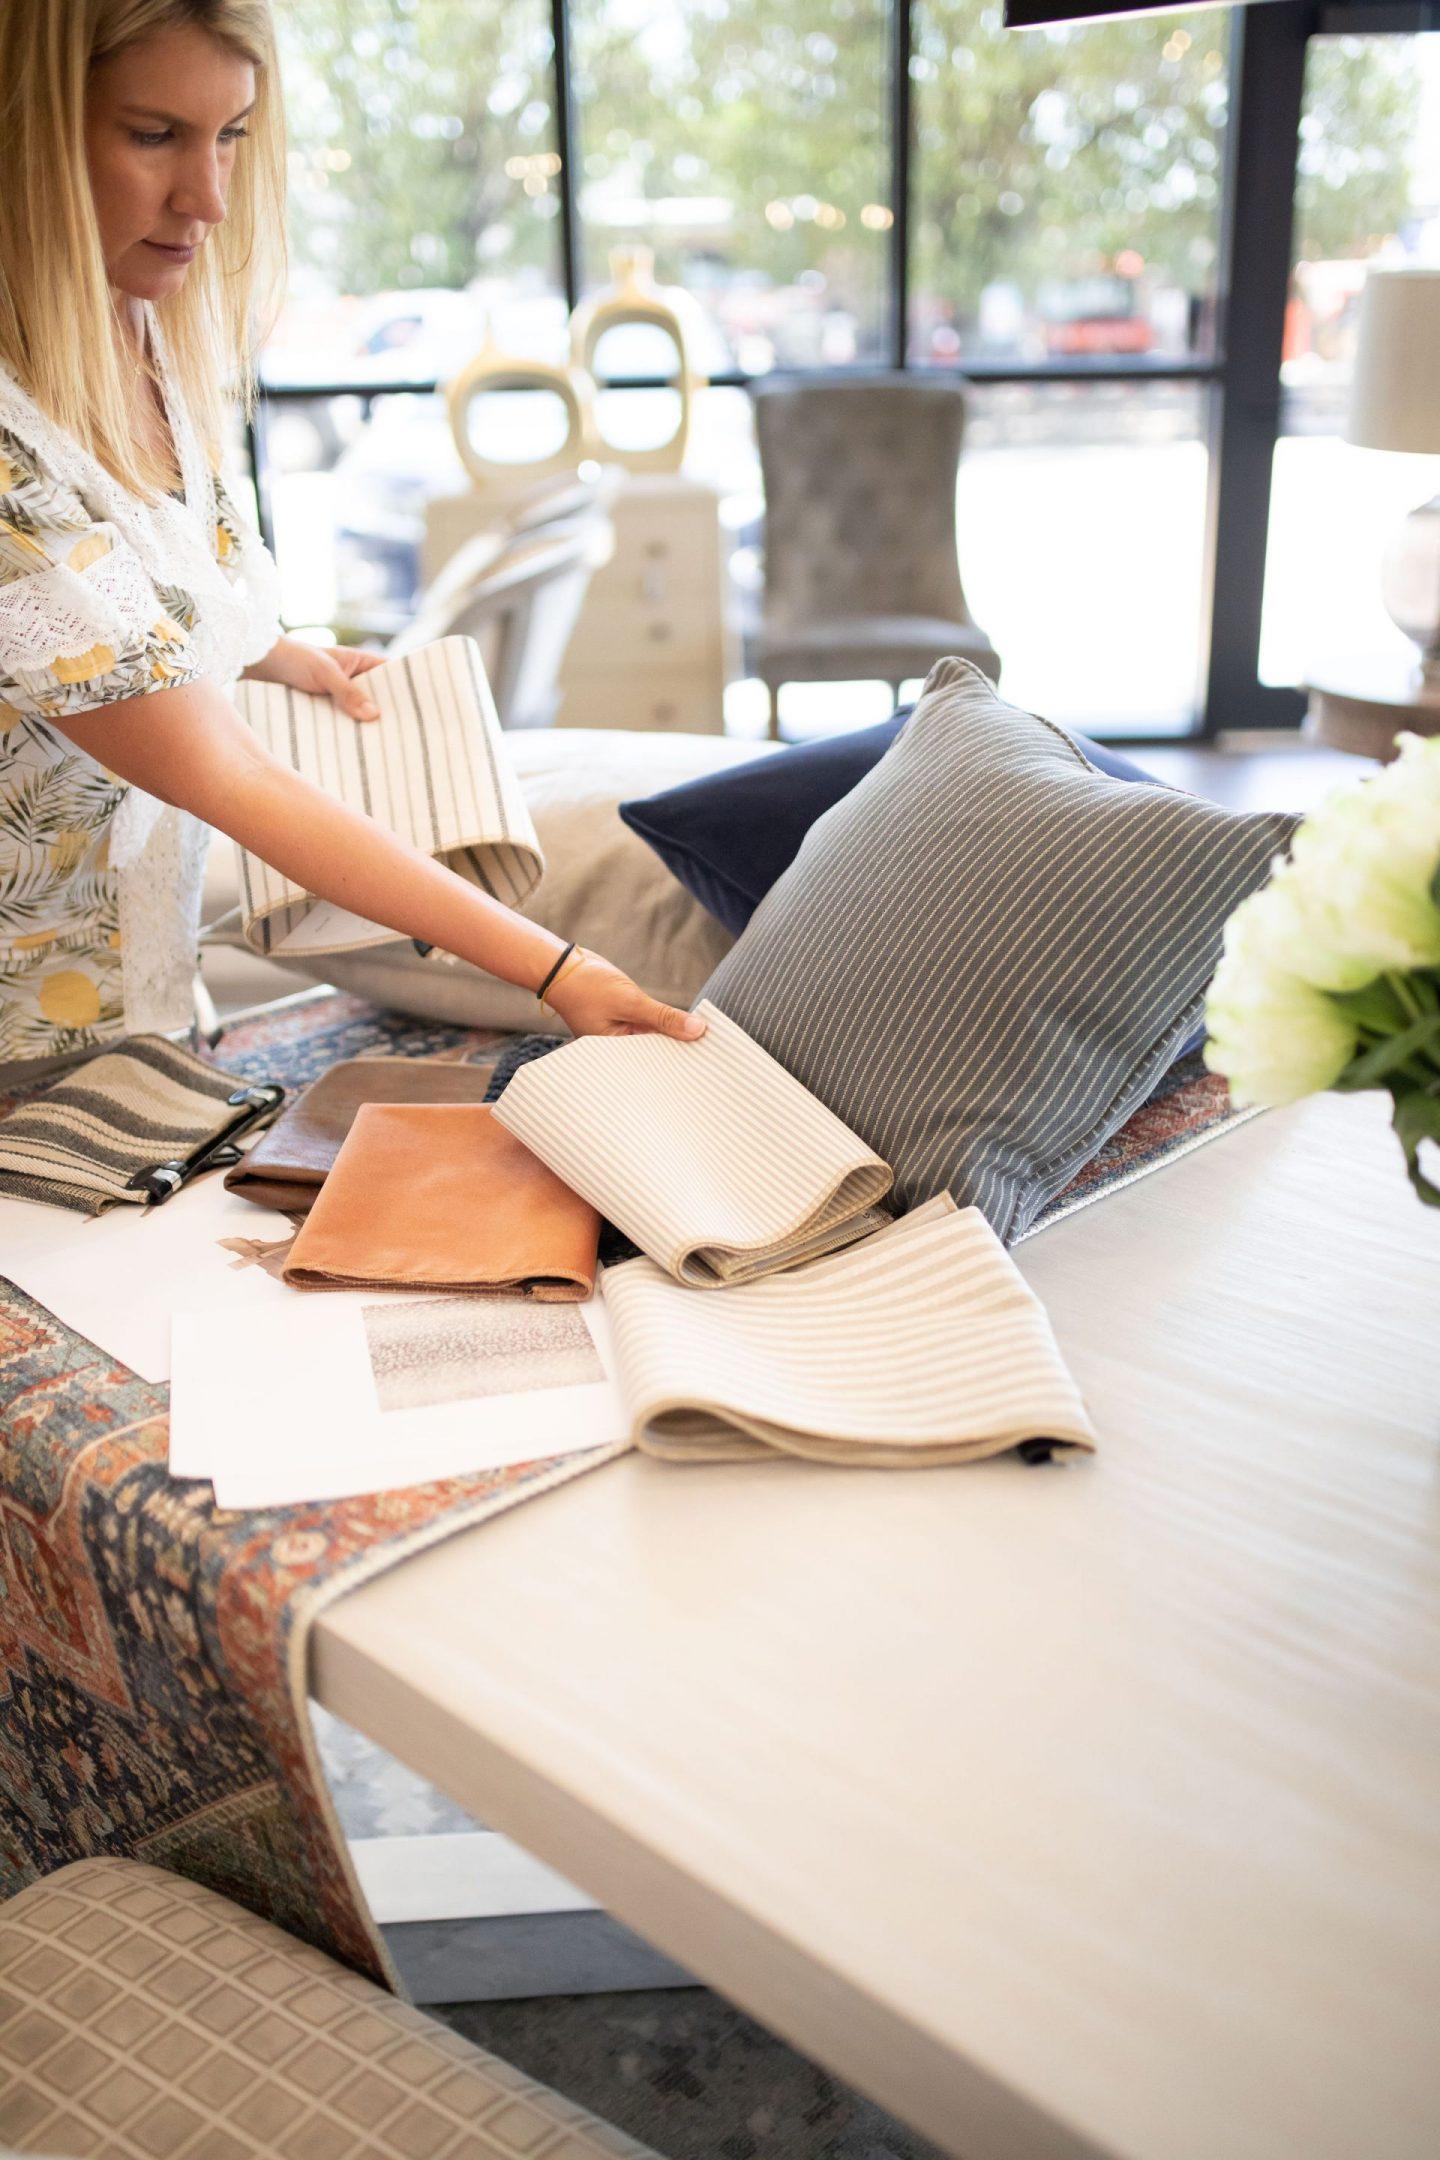 Luxe Furniture, Home decor, Design, Interior Design, Luxe Tulsa, Neutral Home, Texture home